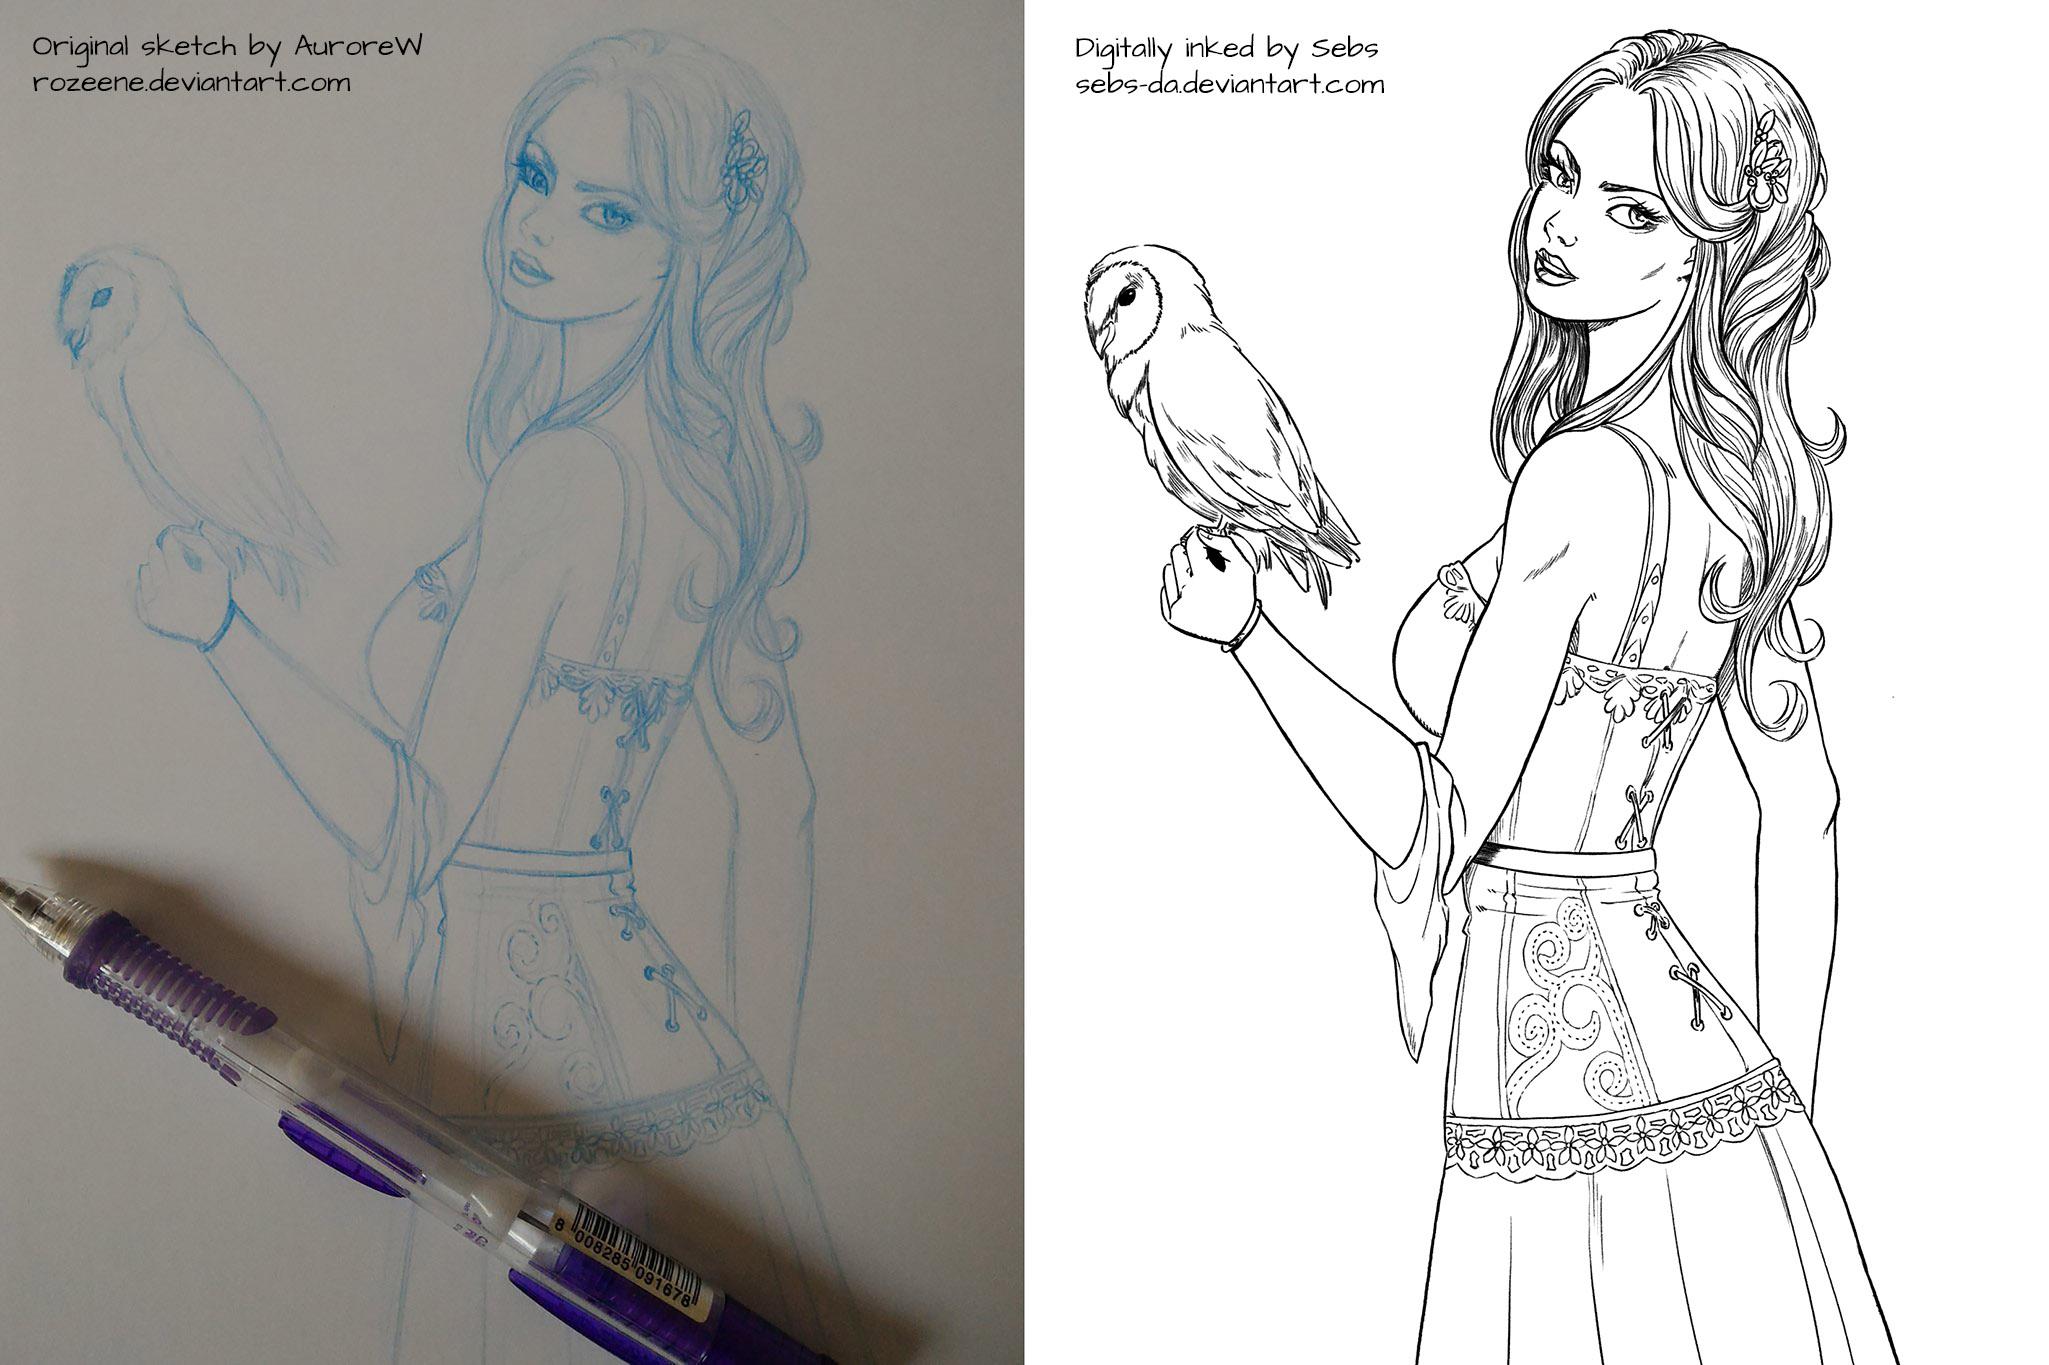 Ink with AuroreW by Sebs-DA